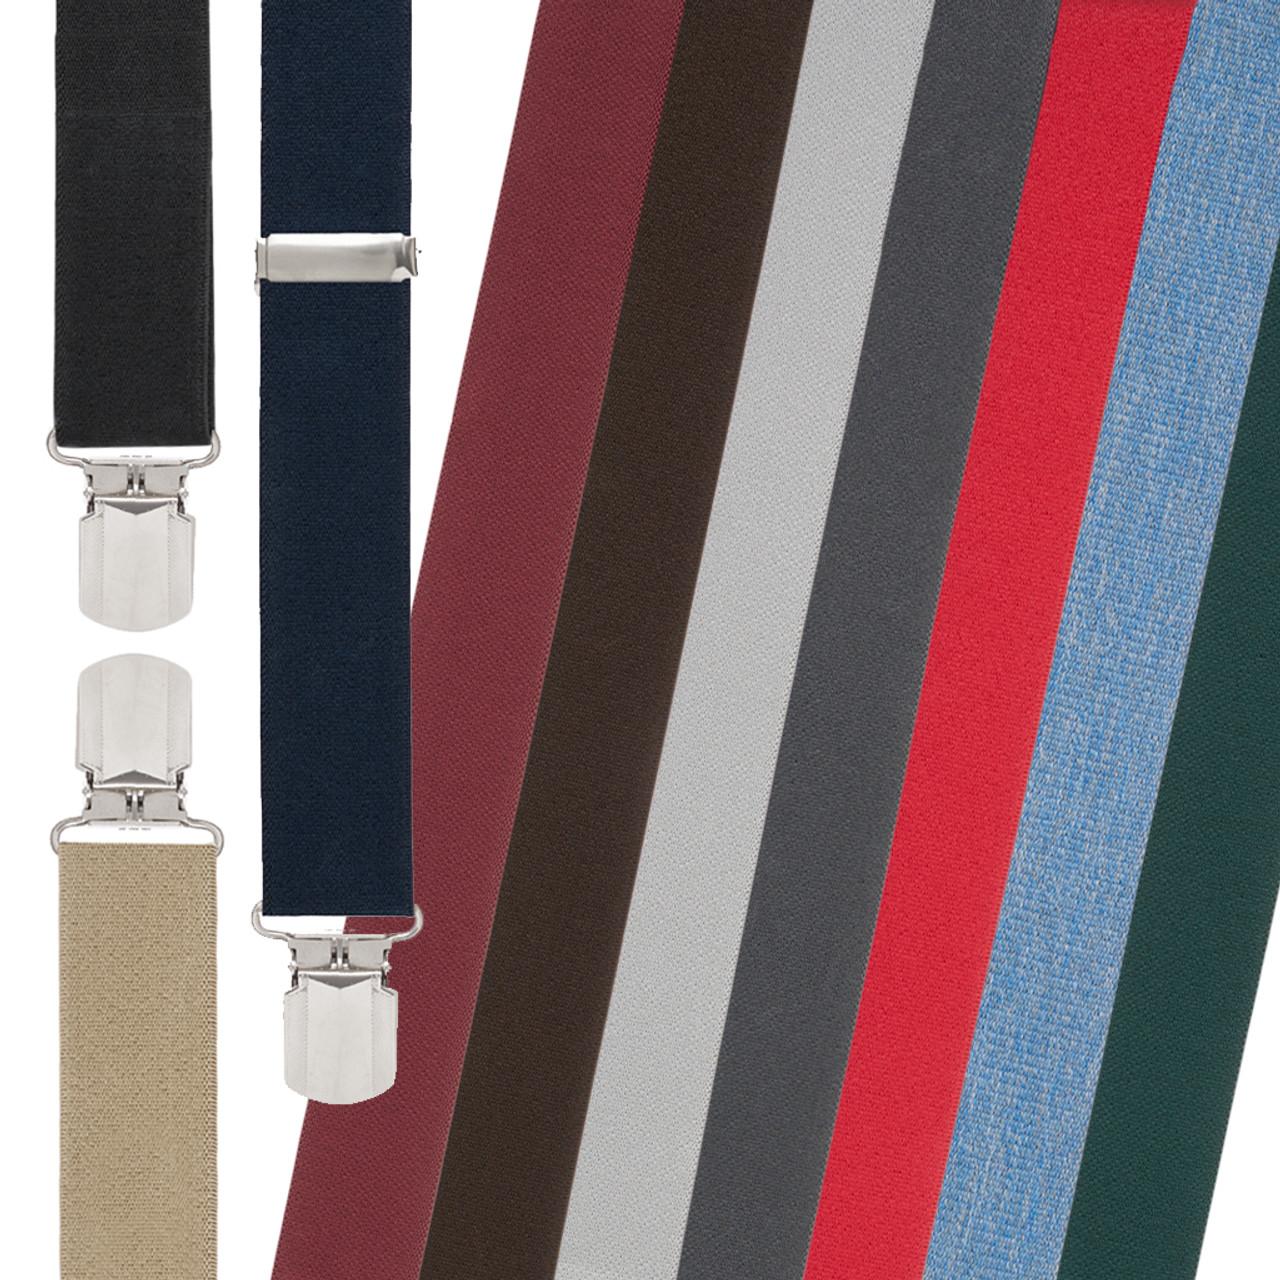 1.5 Inch Wide Pin Clip Suspenders